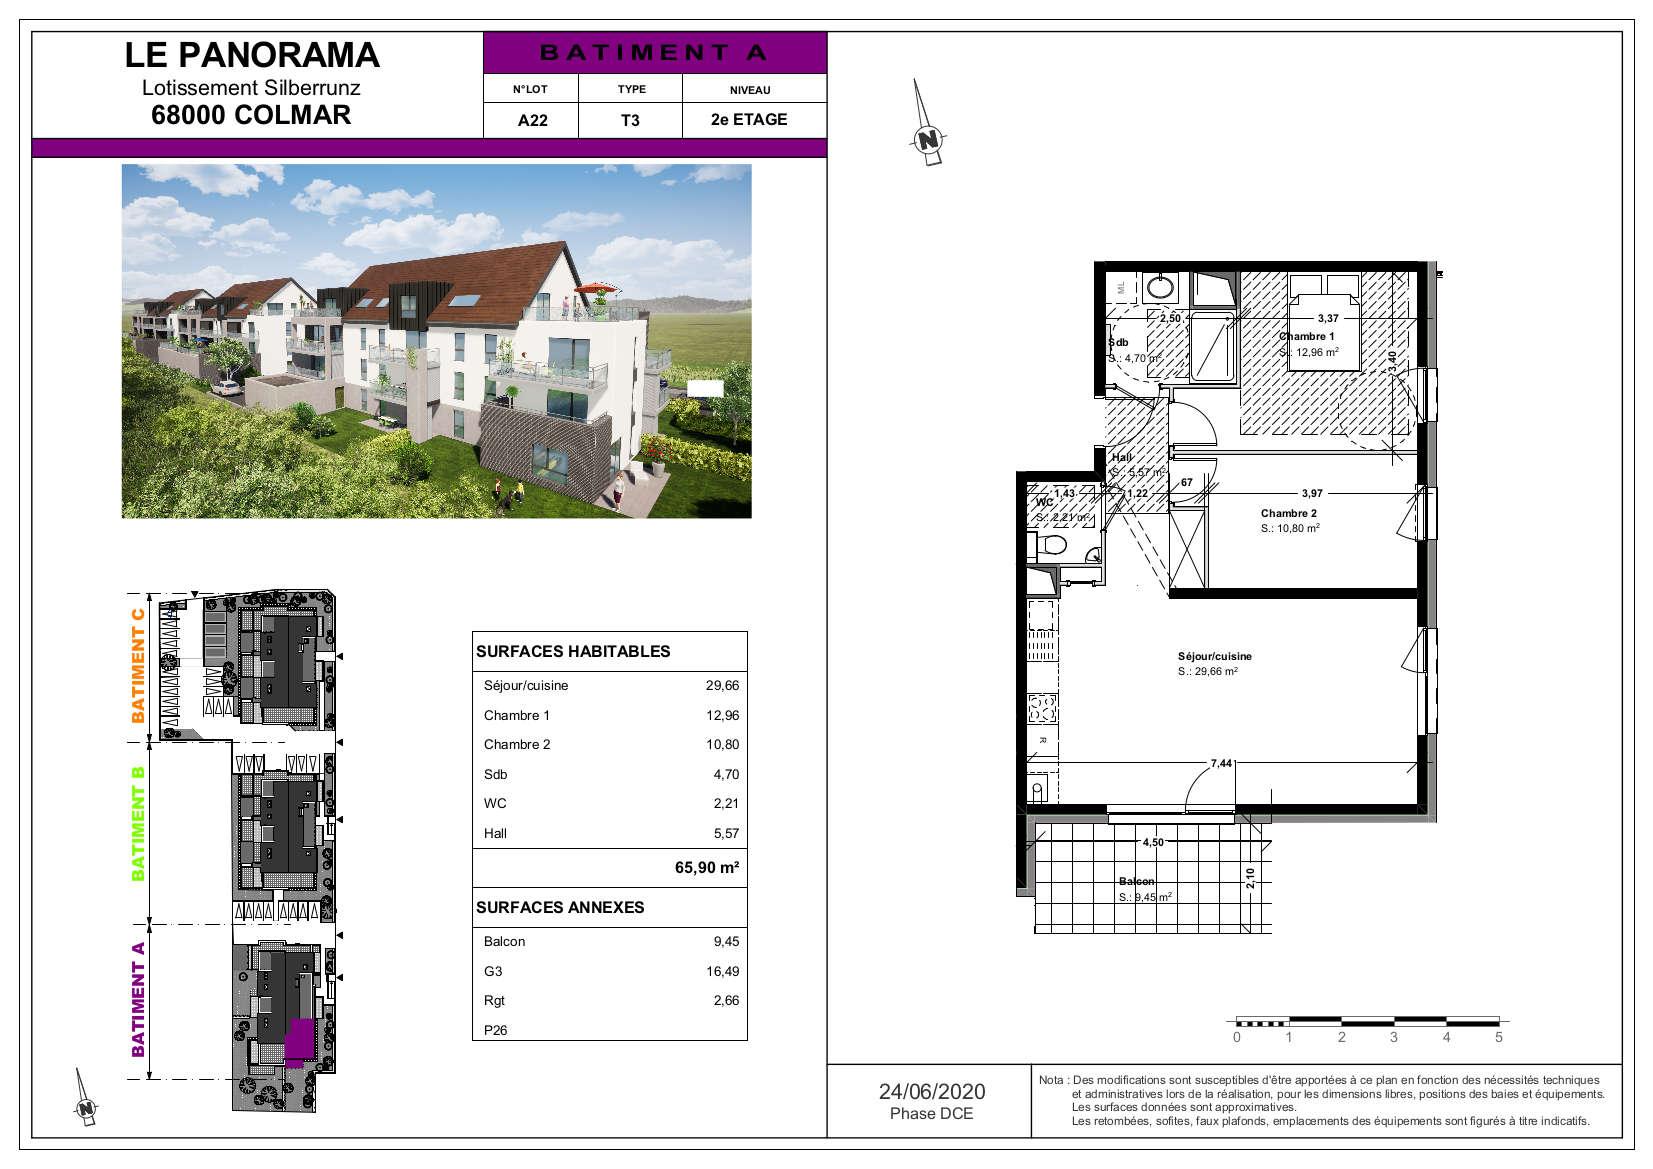 appartement 3 pièces terrasse sud Colmar maraichers lot A22